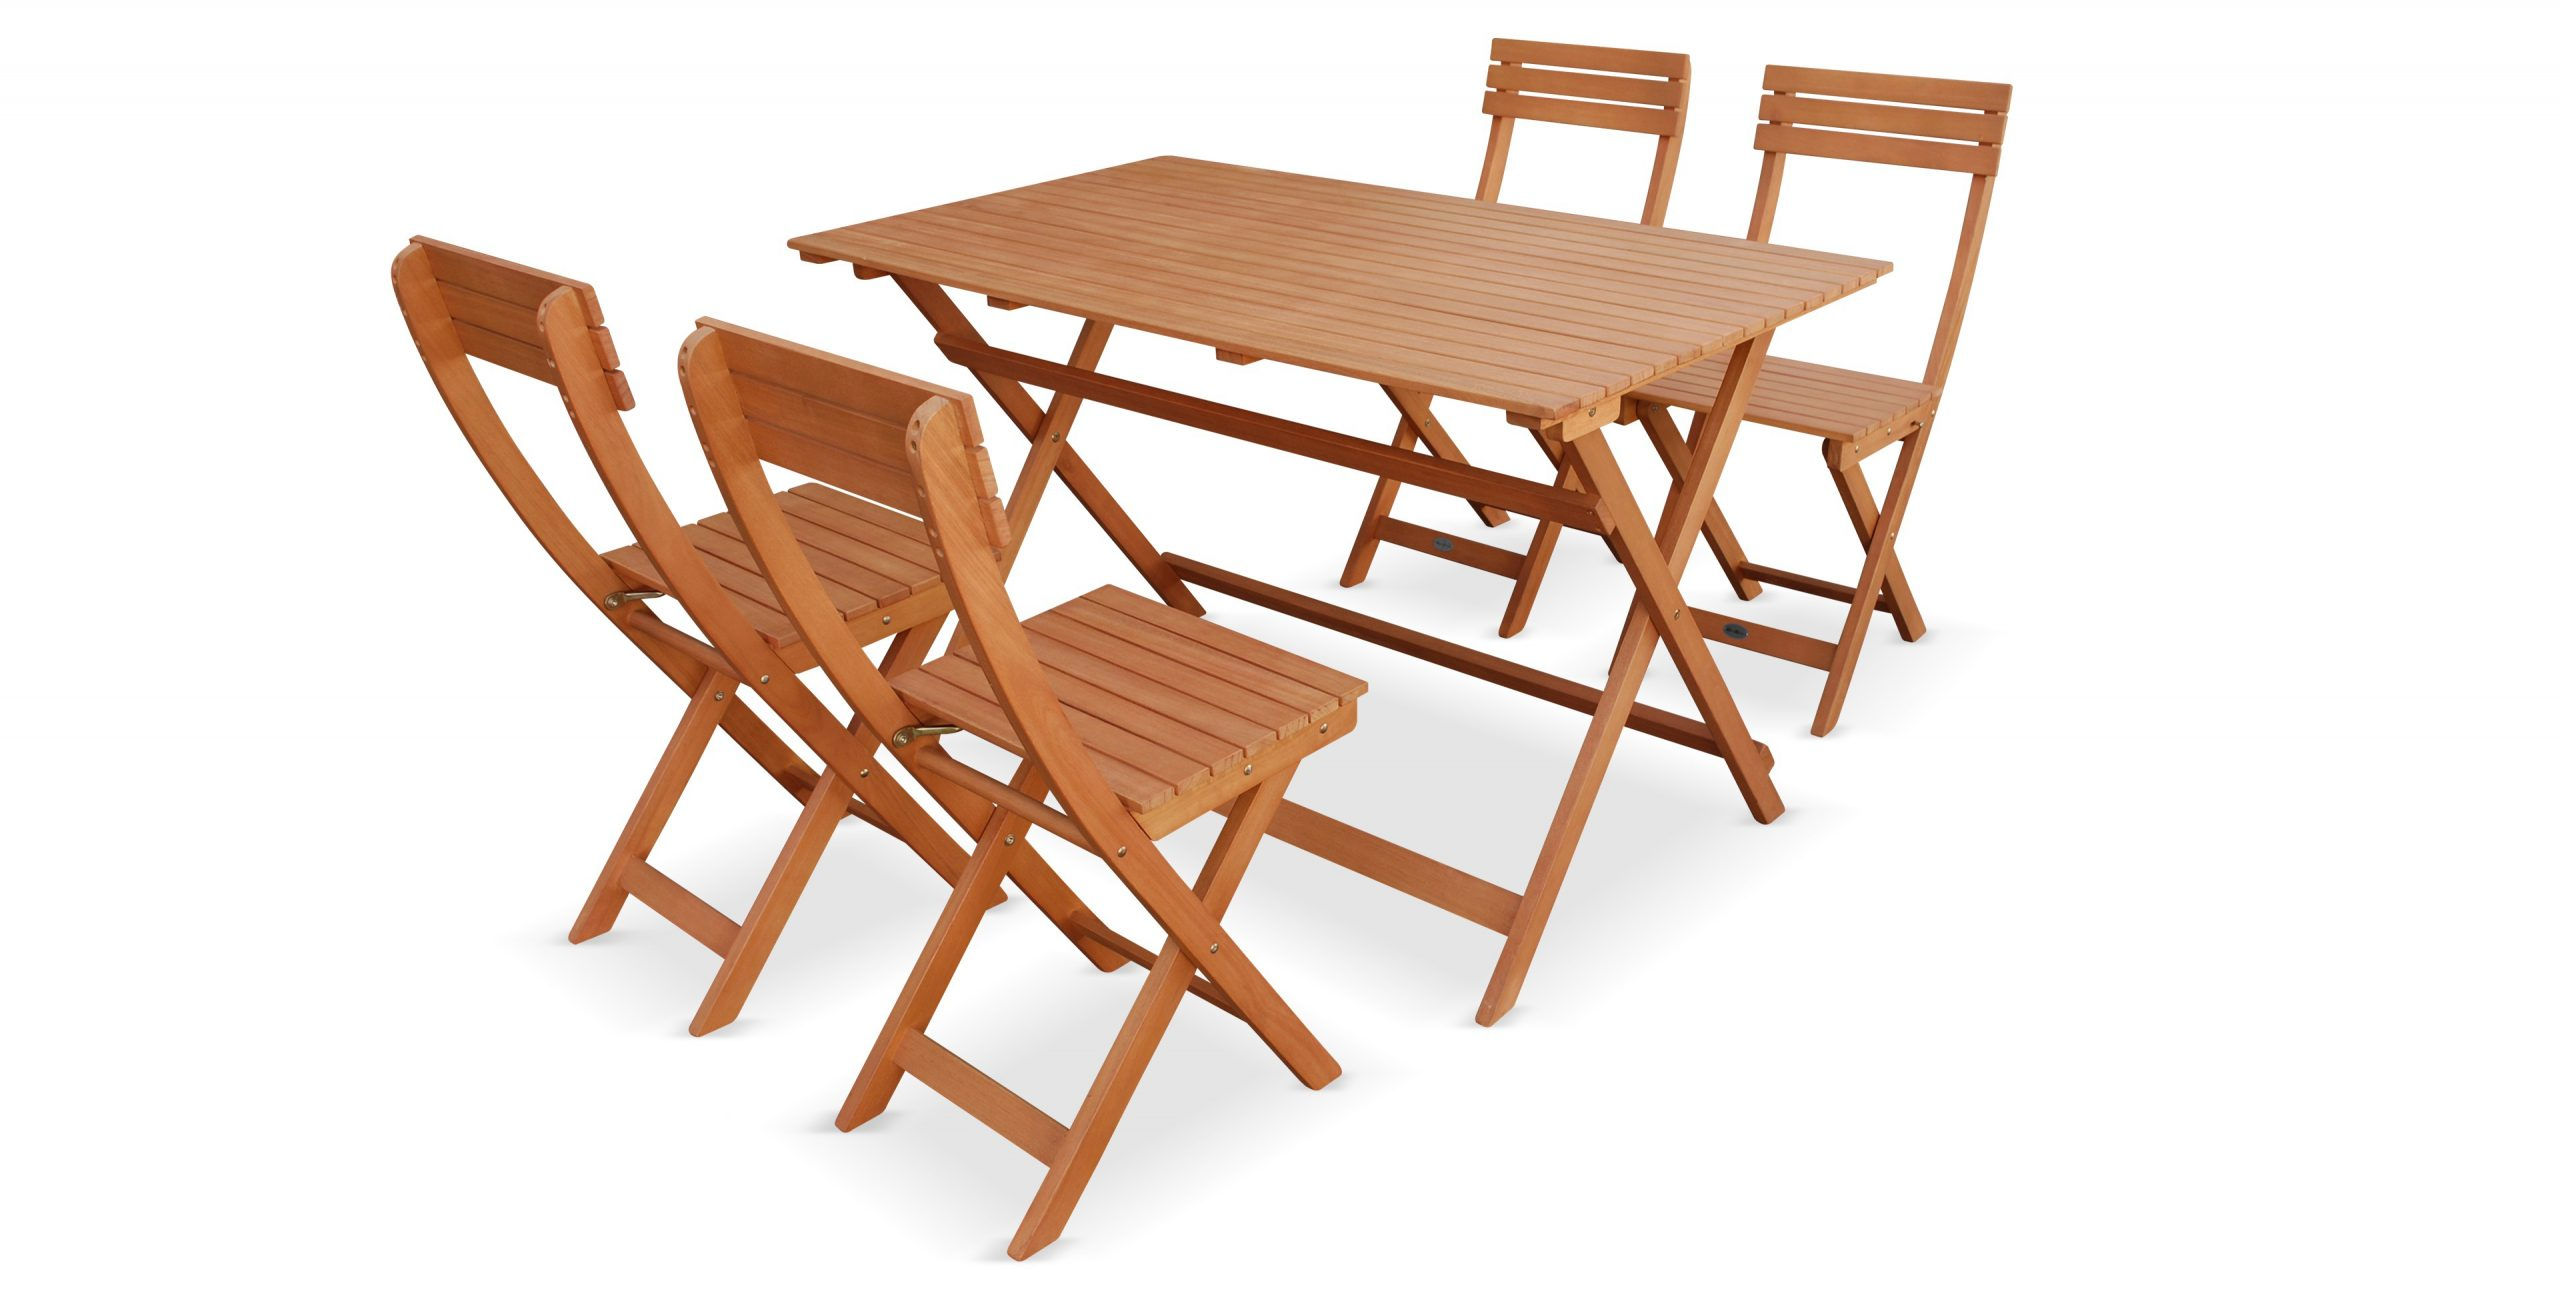 De Pliante Table Bois Pliante De Jardin Jardin Bois Table ... concernant Table De Jardin Pliante